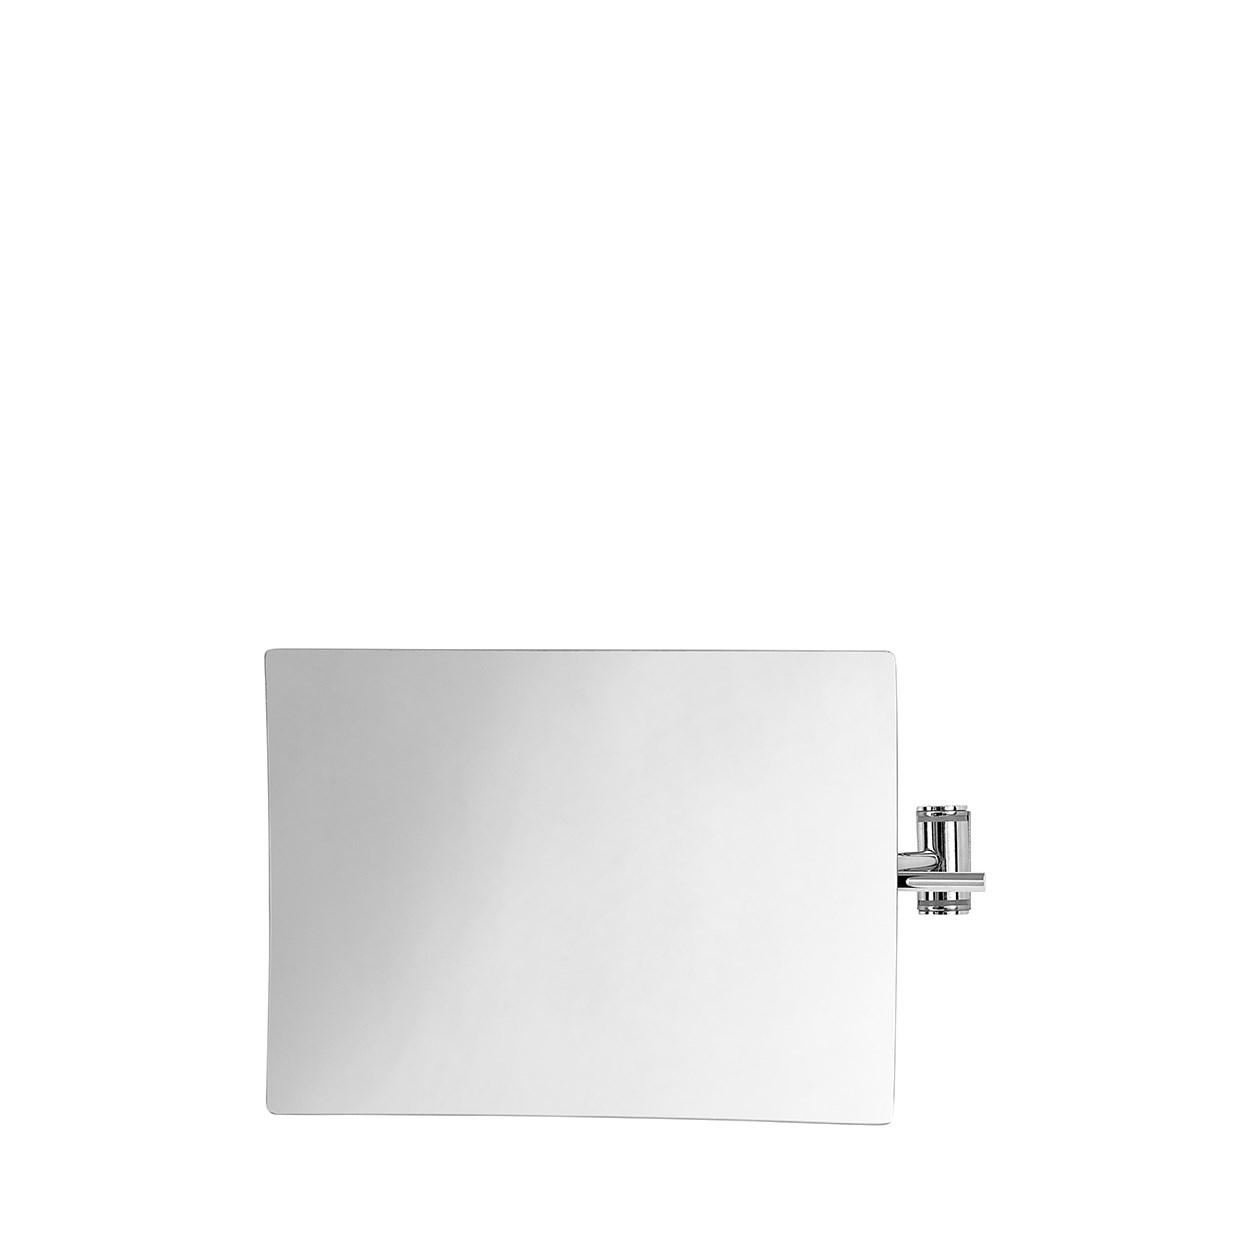 Nástěnné zrcadlo VISTA chrom_1